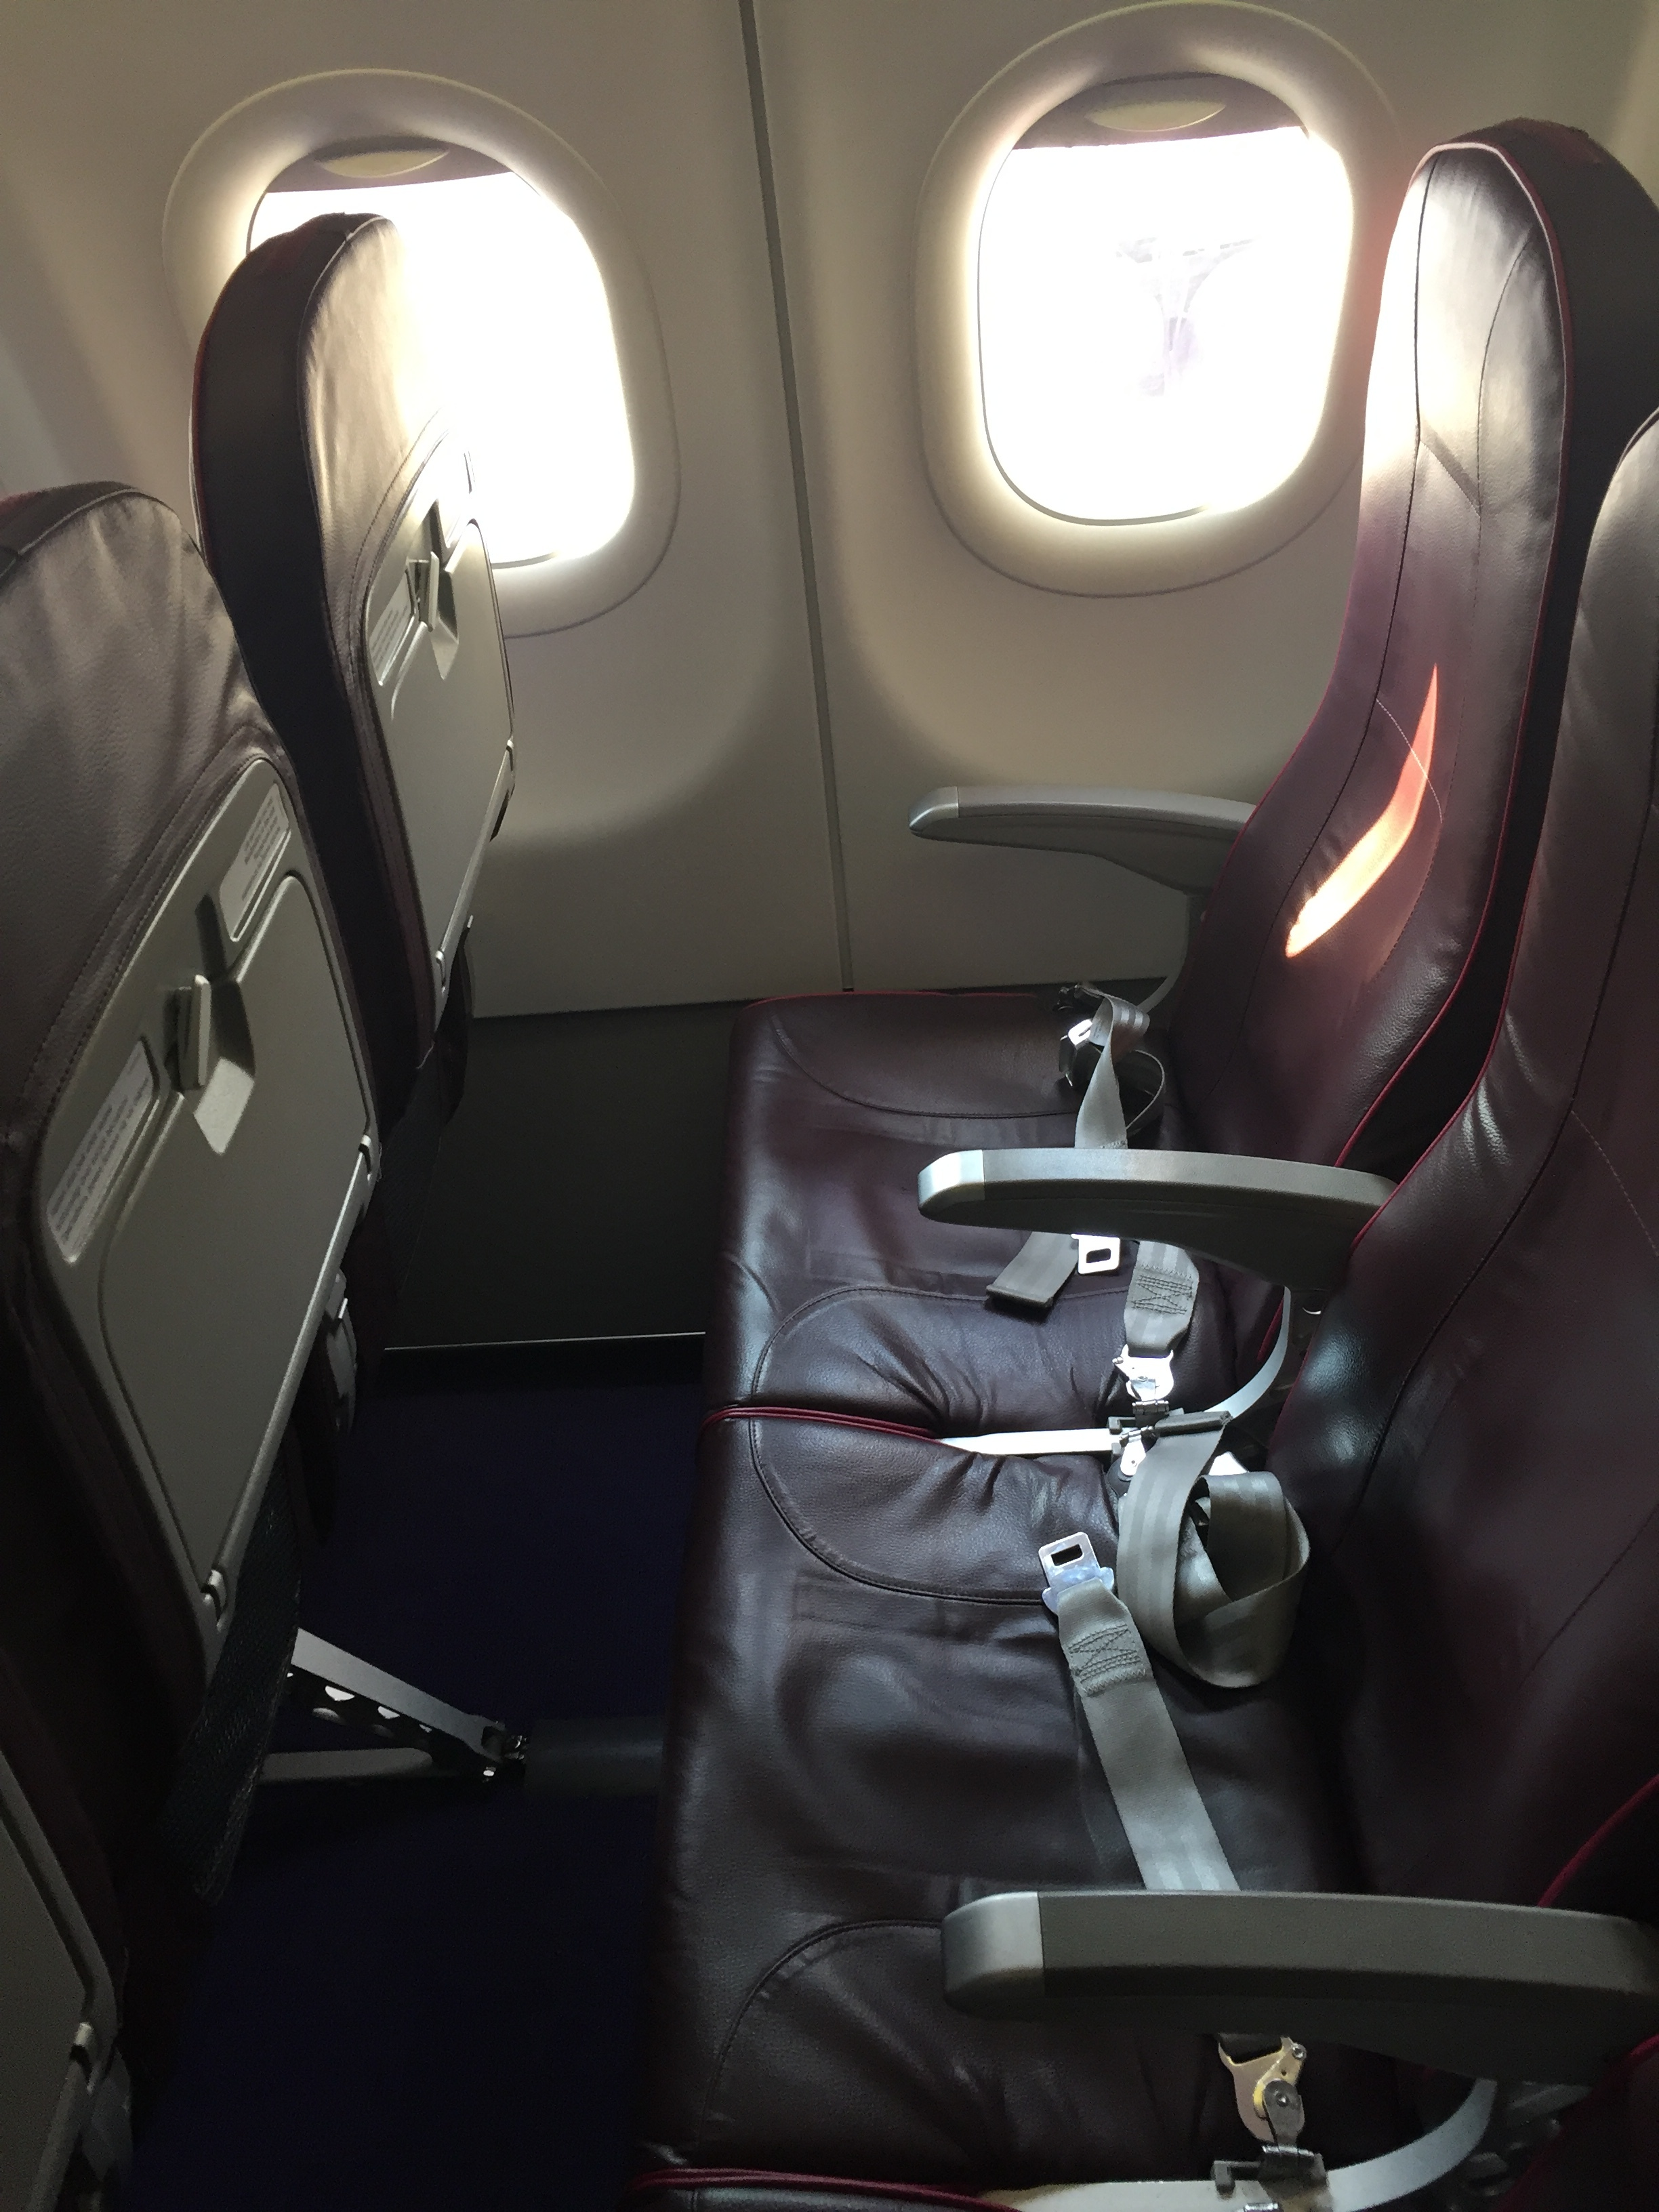 wizzair seat economy.JPG